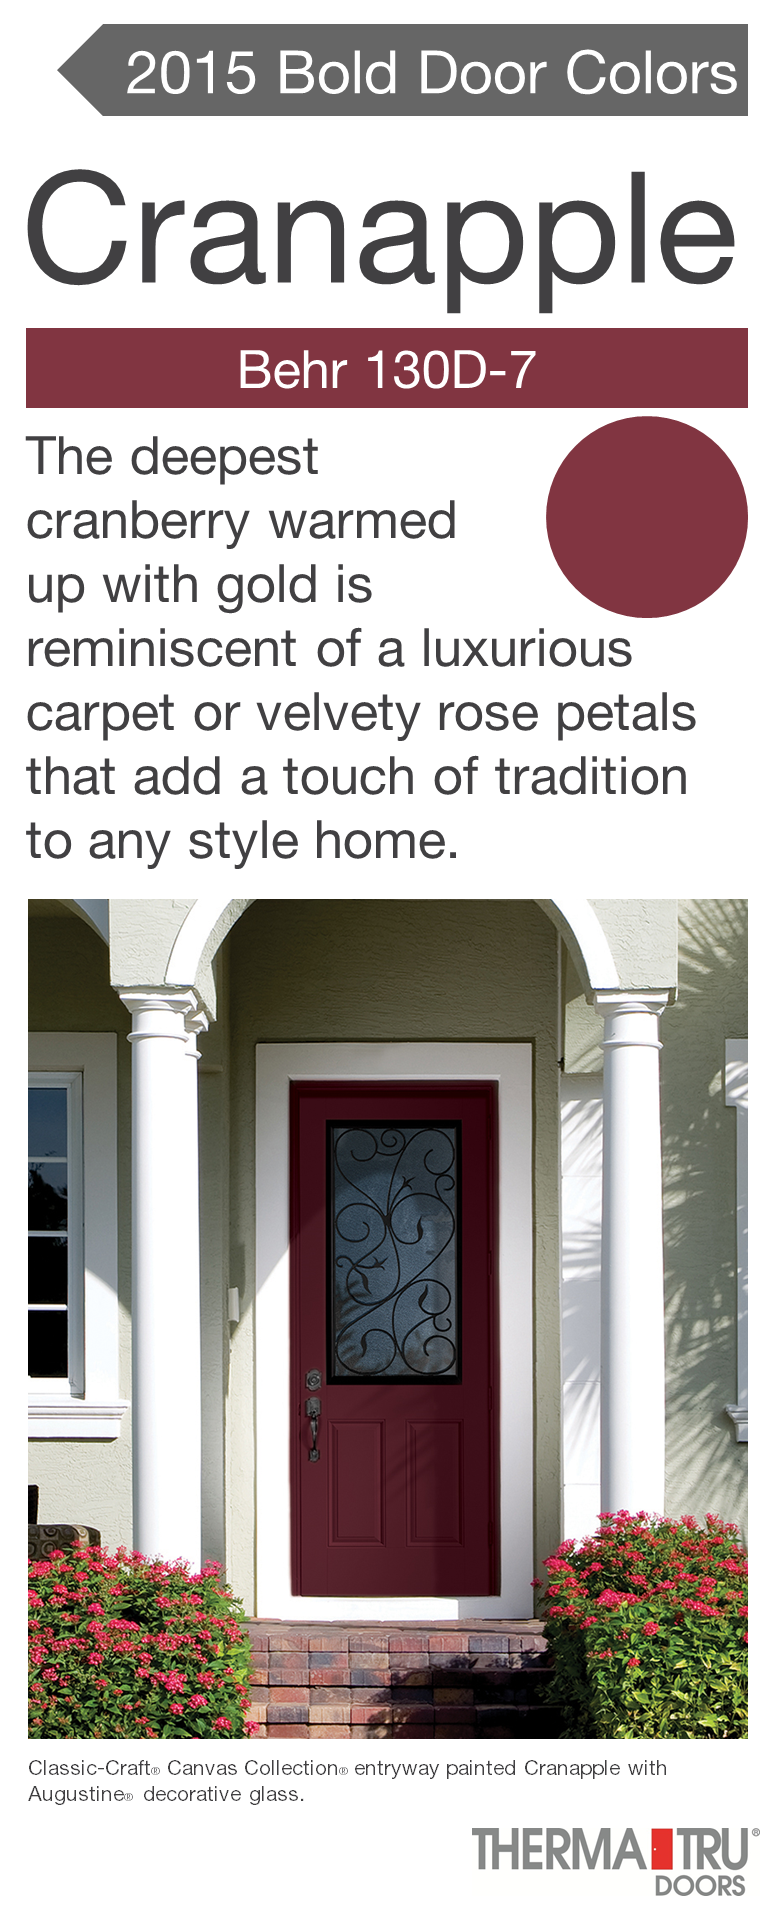 Classic-Craft Canvas Collection fiberglass door painted Cranapple ...